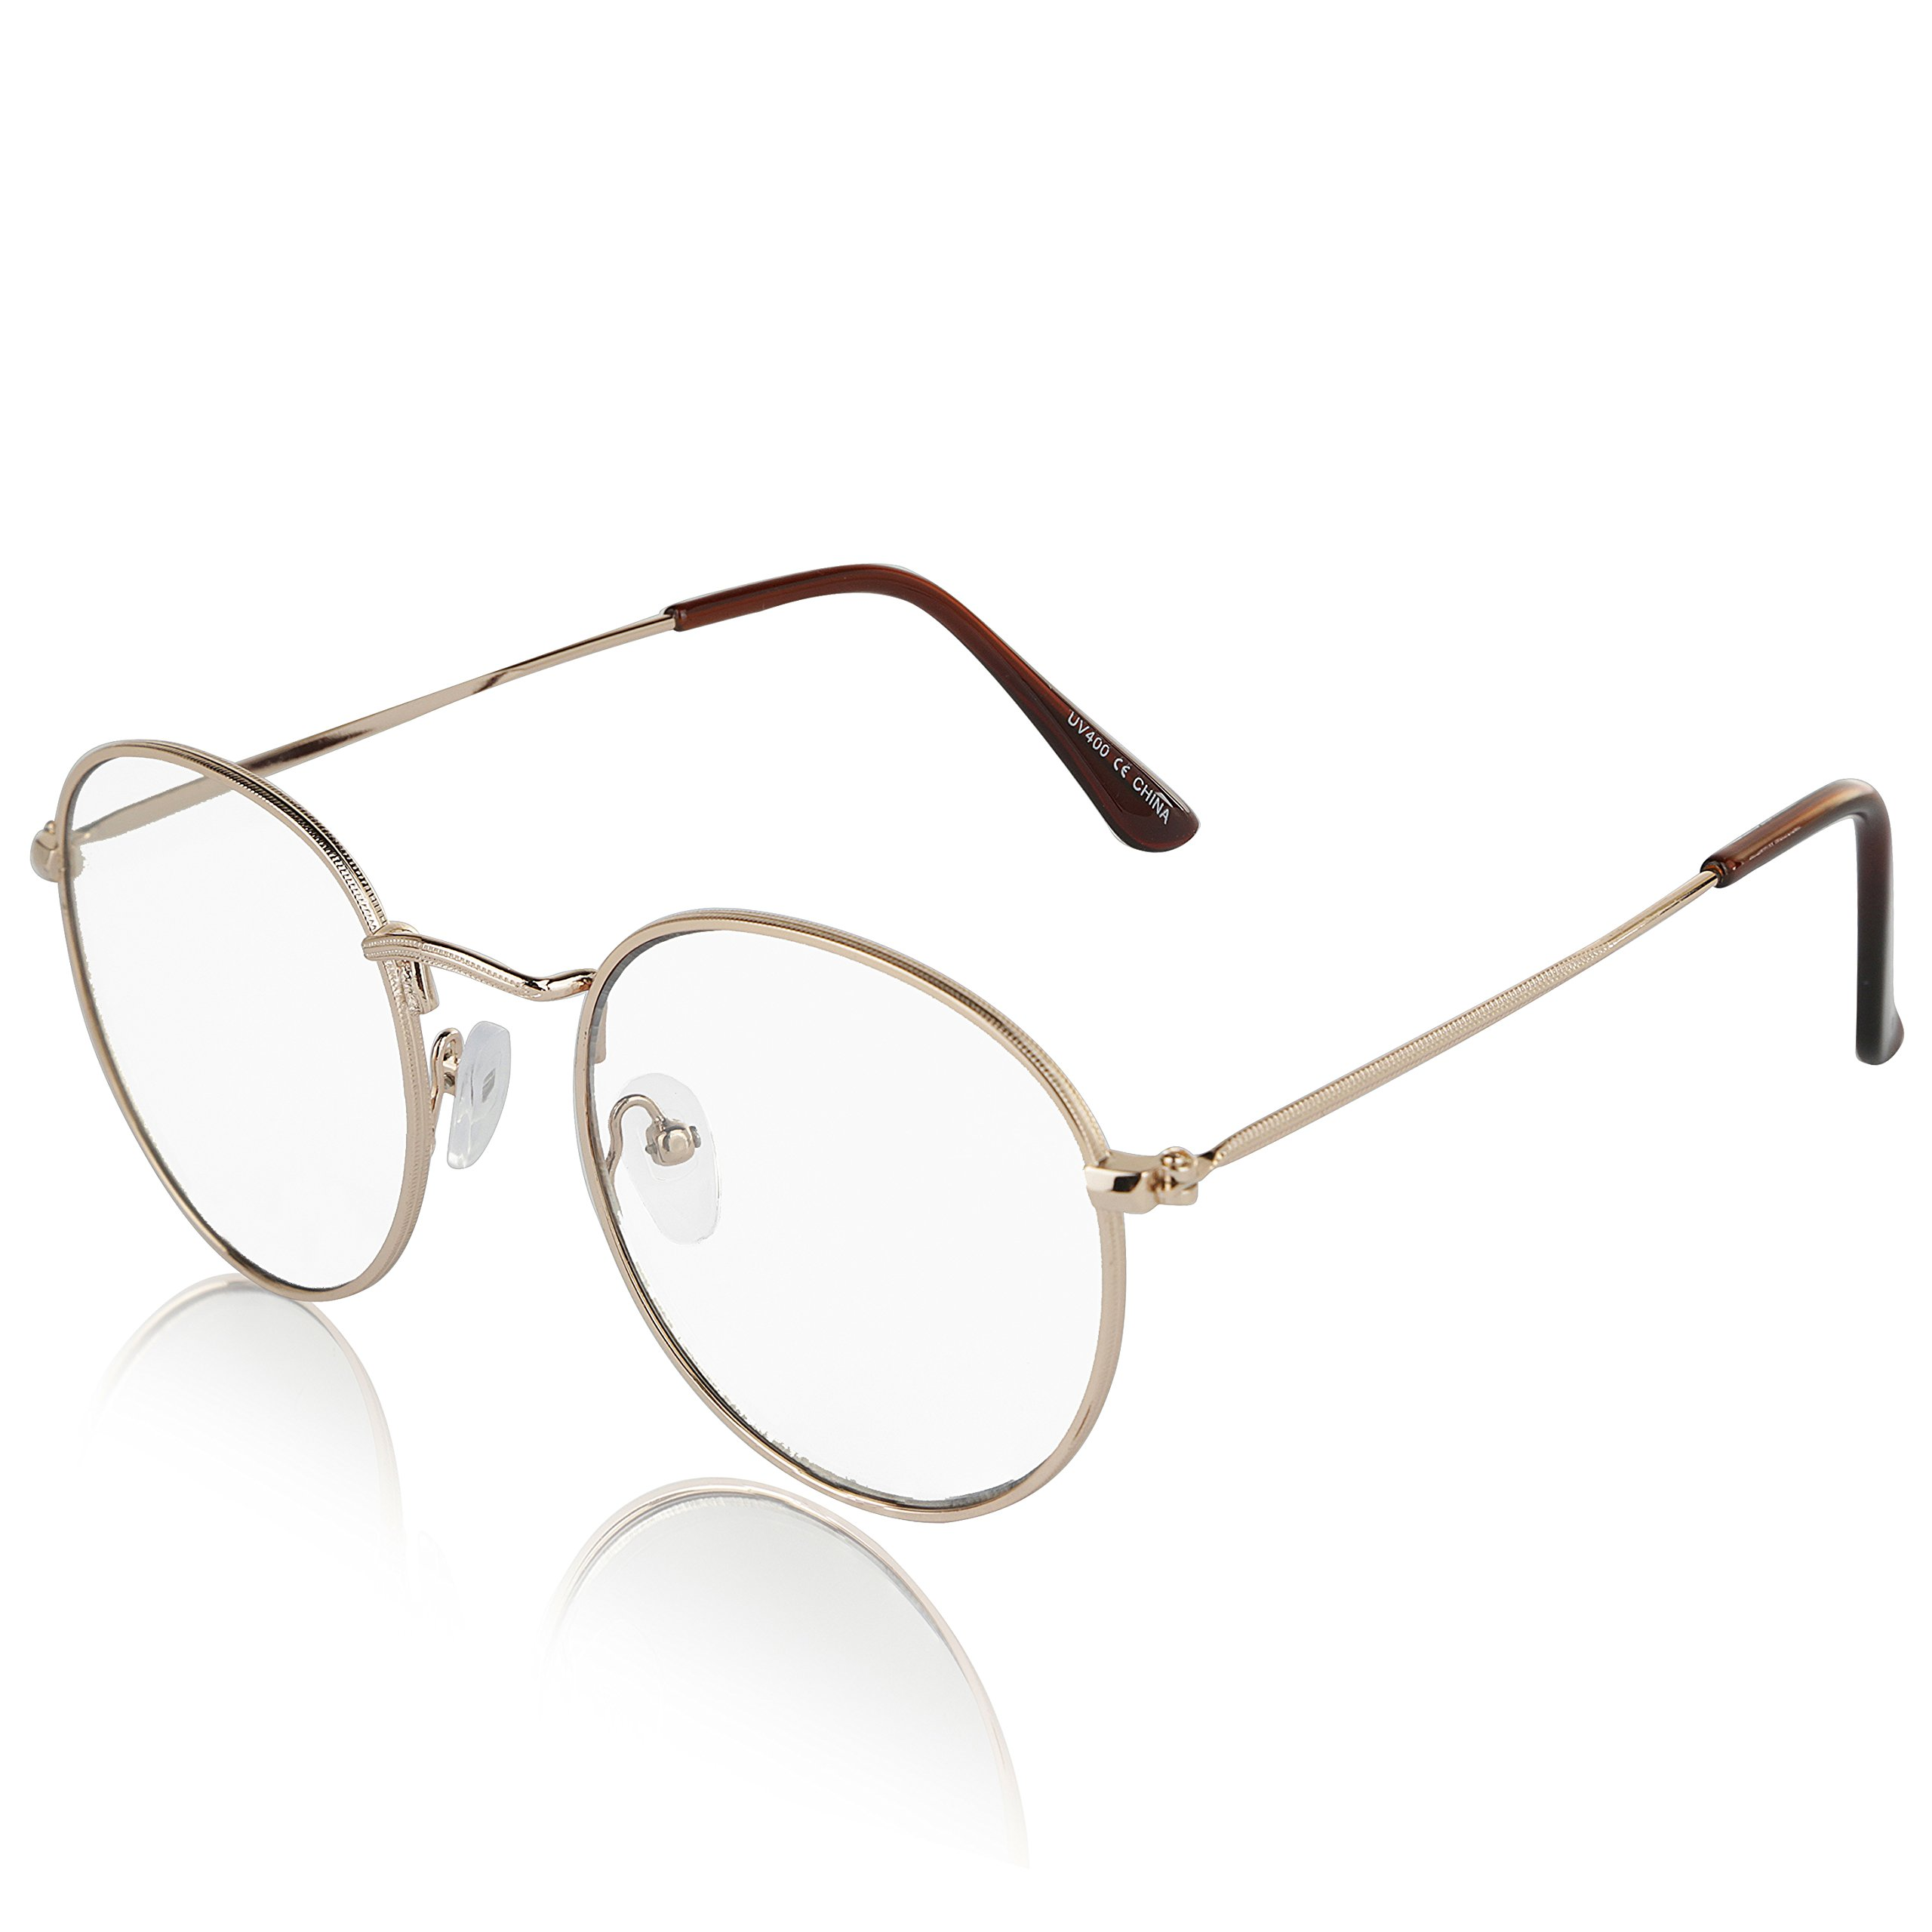 12bf1645aa6 Details about Non Prescription Retro Fake Clear Lens Gold Metal Frame  Eyeglasses Woman UV400